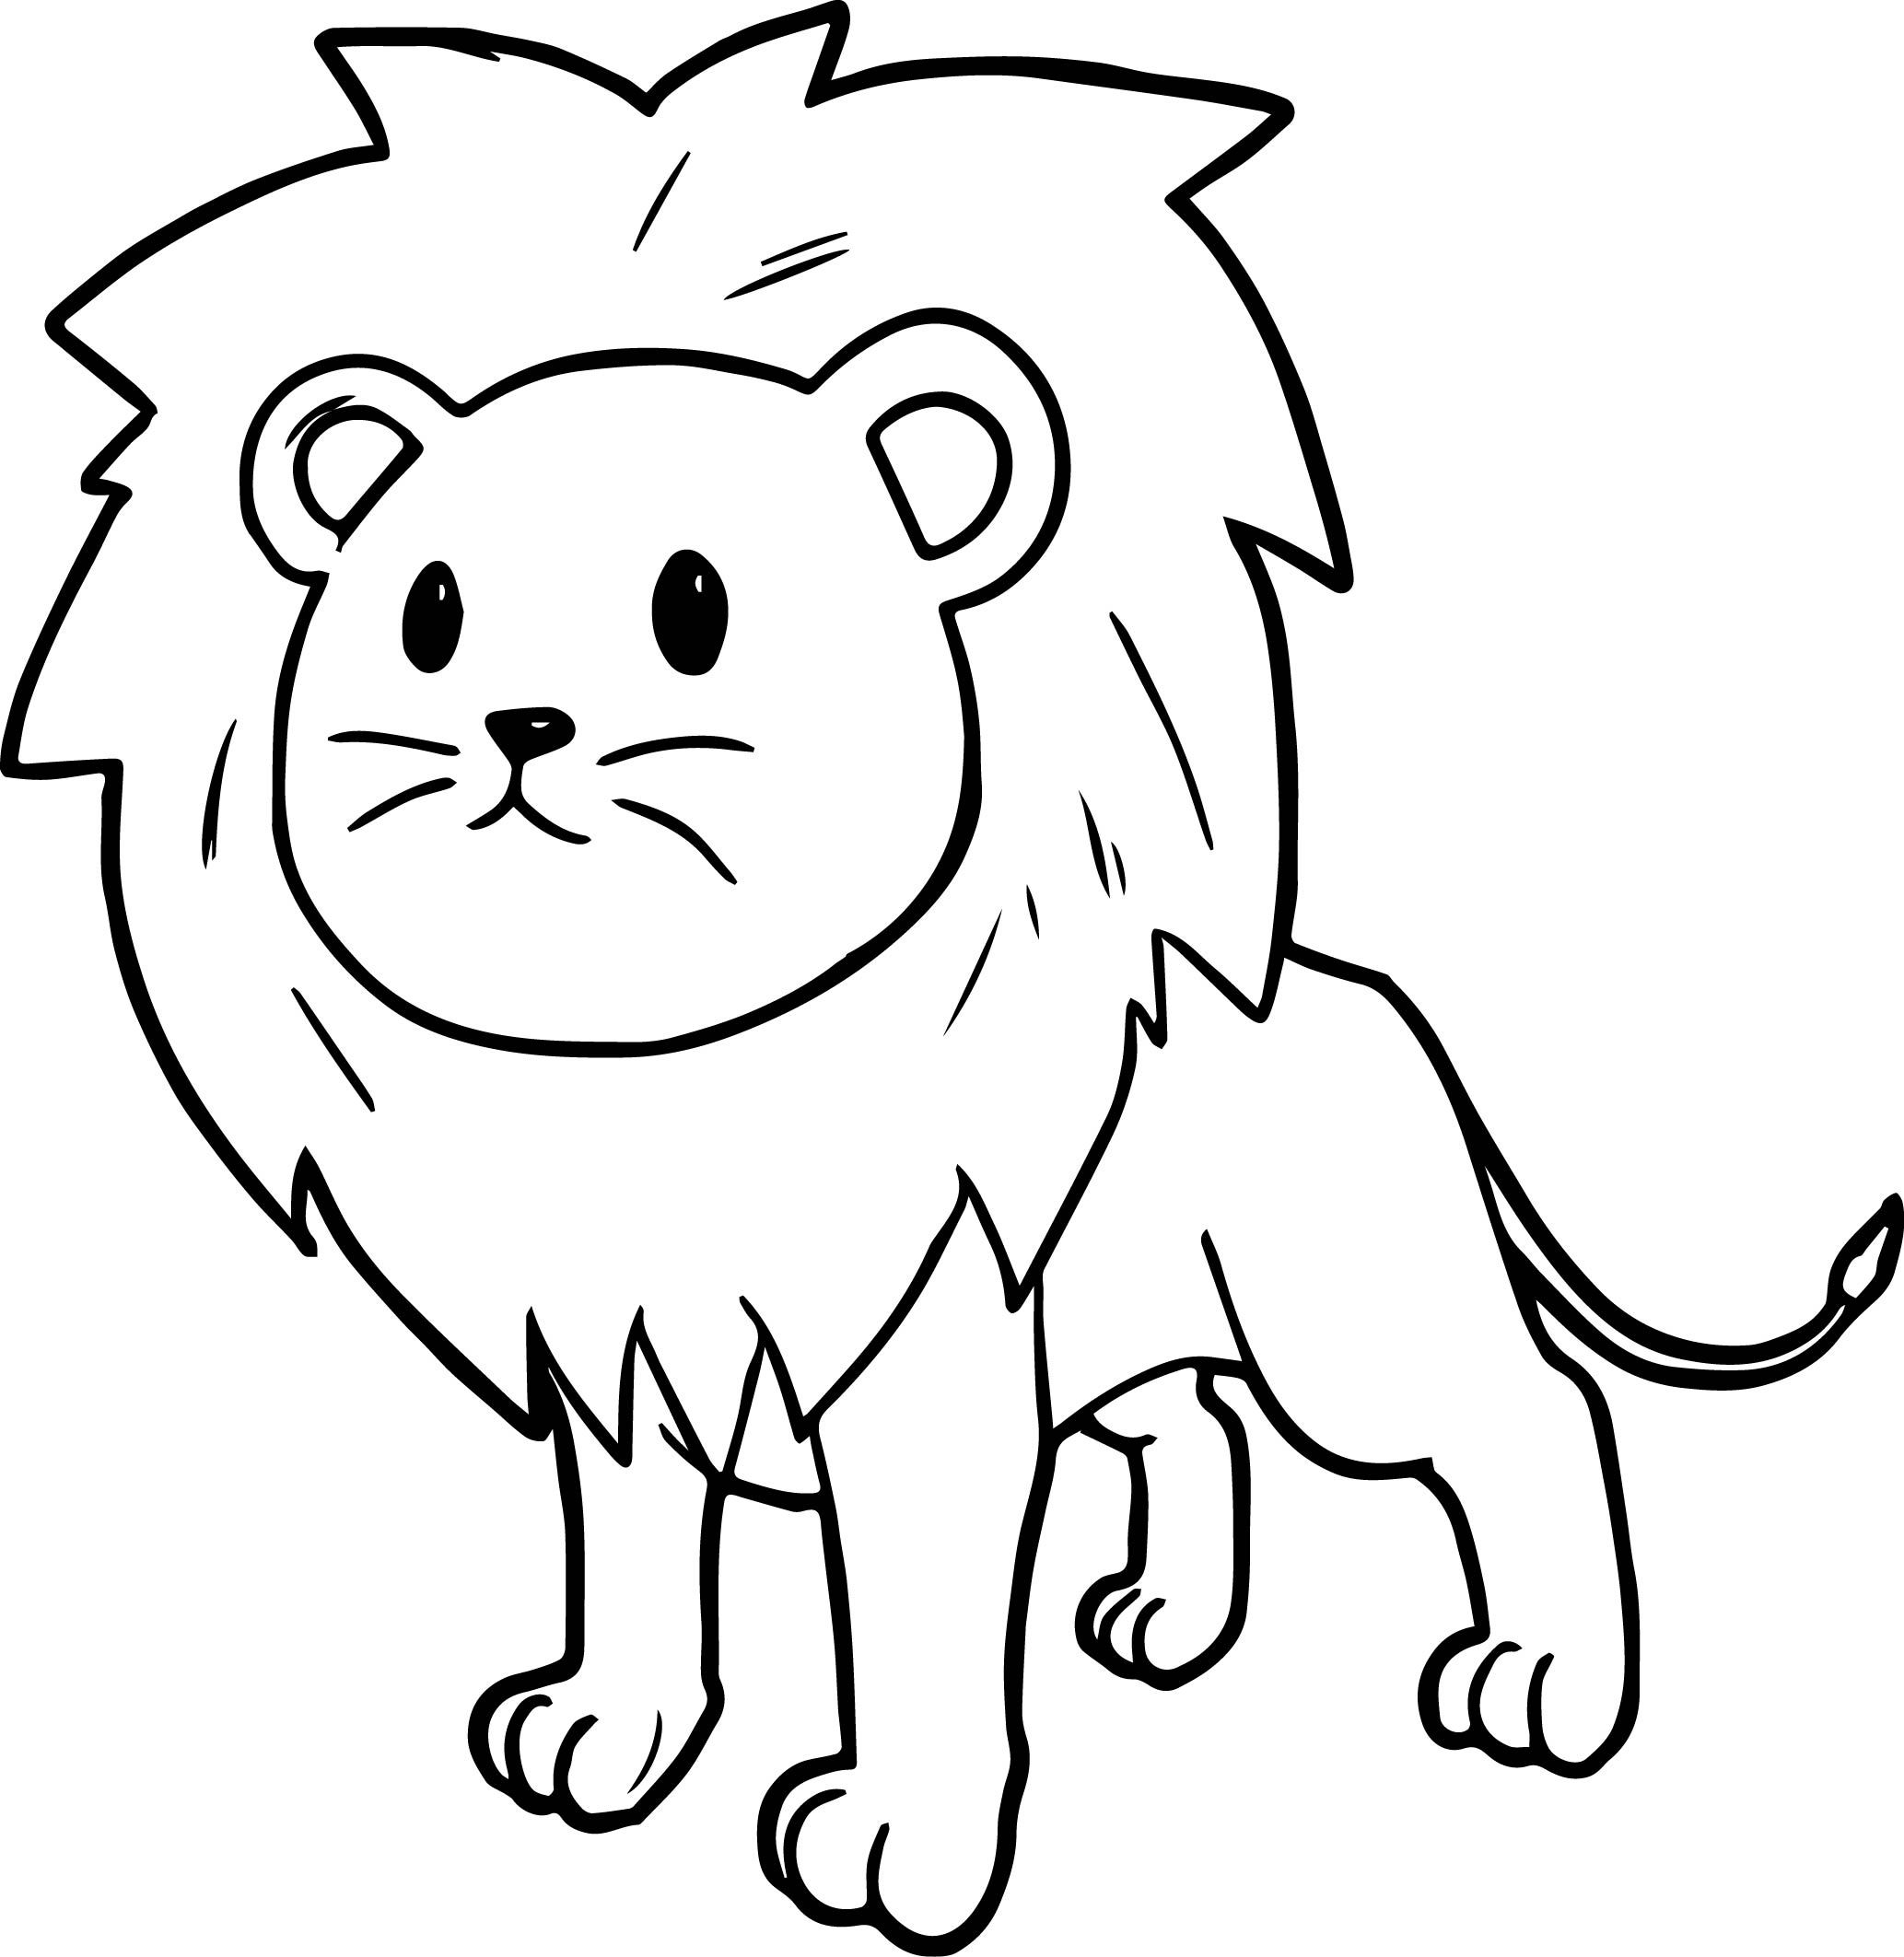 Lion Coloring Pages Cartoon Lion Cartoon Coloring Pages [ 2125 x 2067 Pixel ]